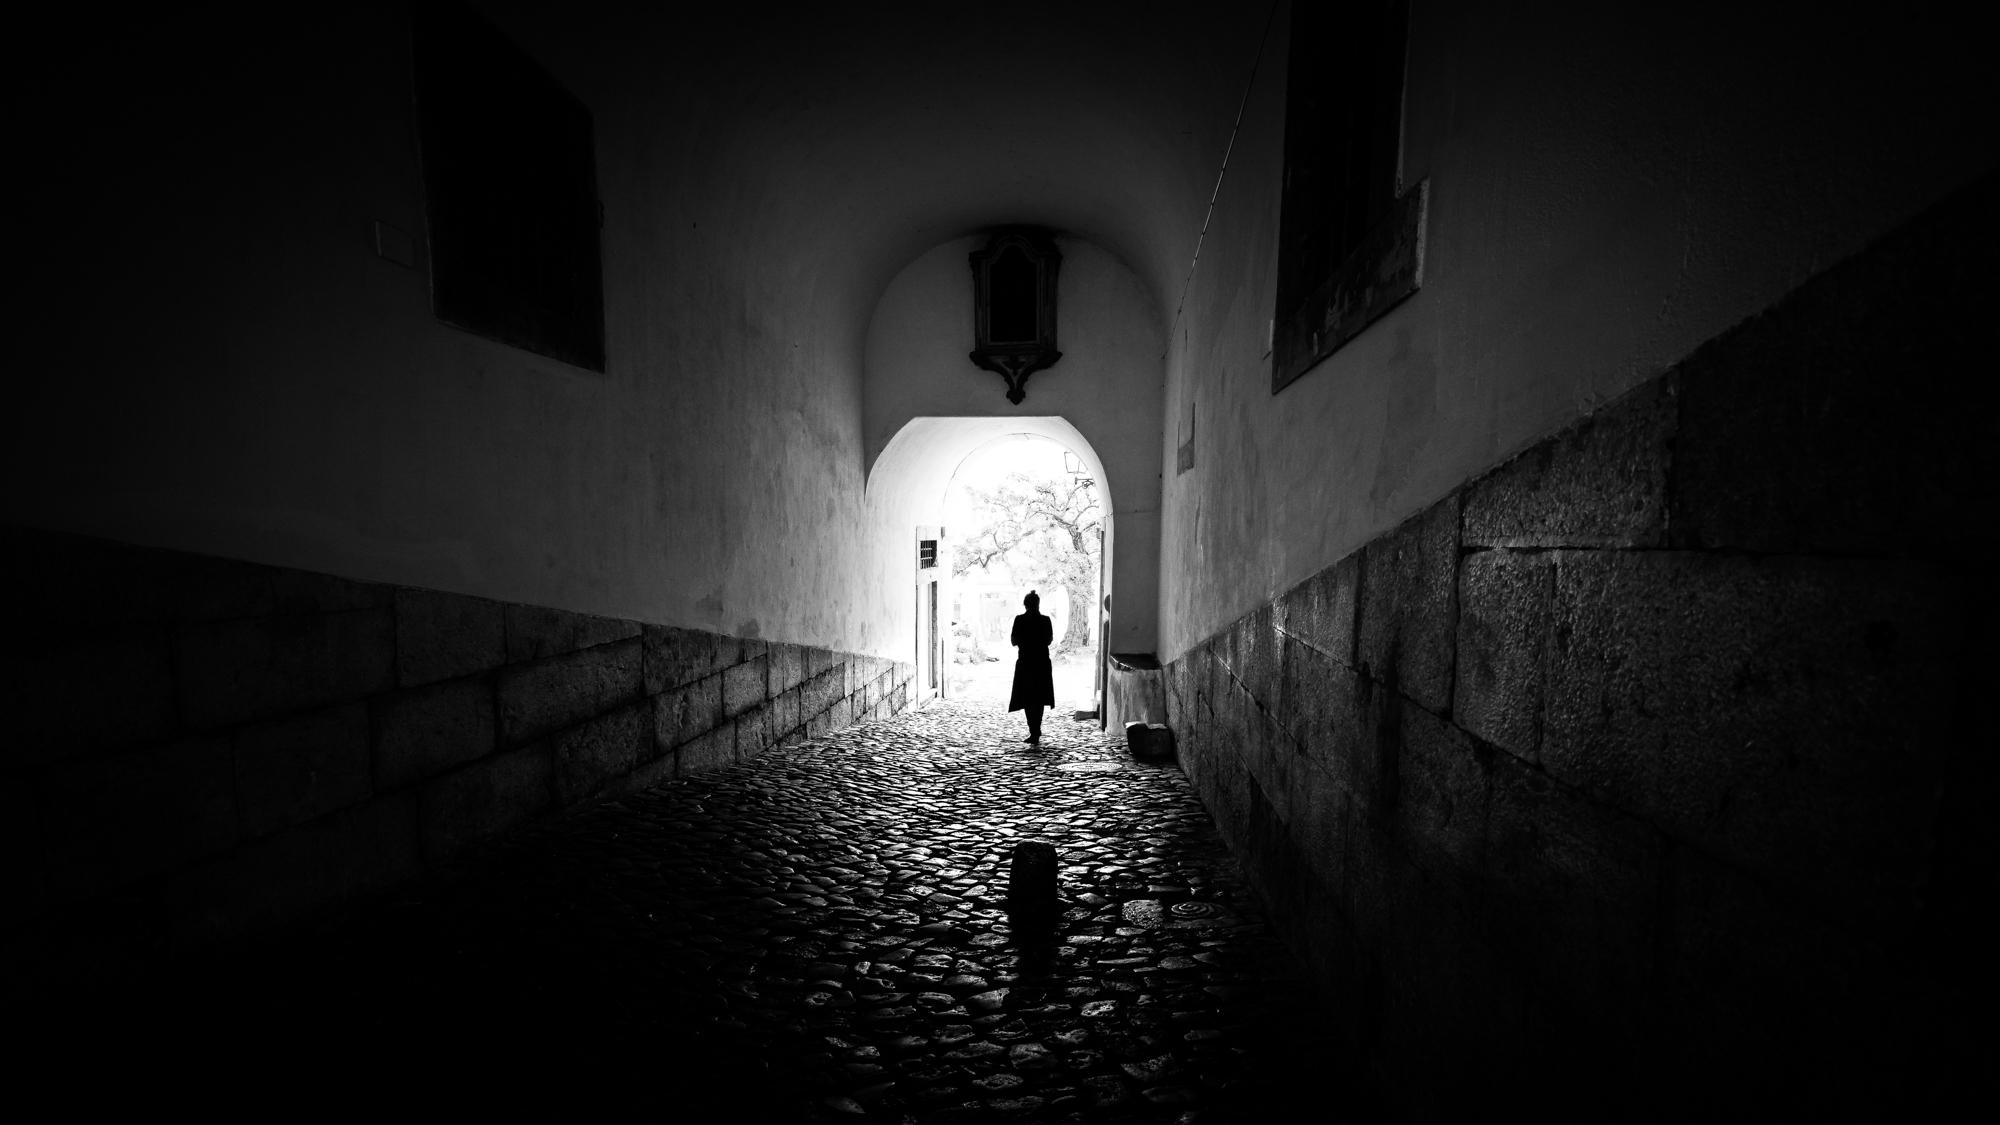 Very Sad Wallpaper Love Girl Giuseppe Milo S Faceless Combines Street Photography And